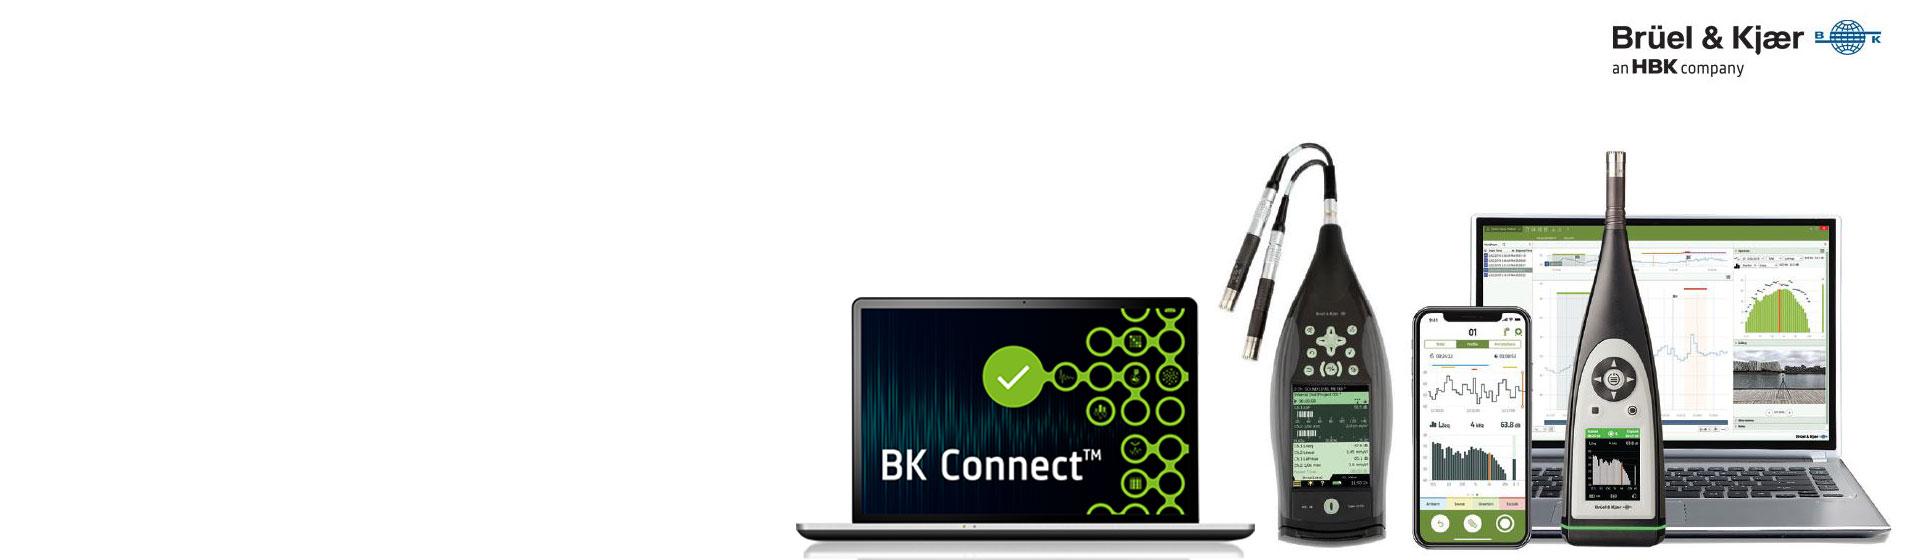 bk-banner